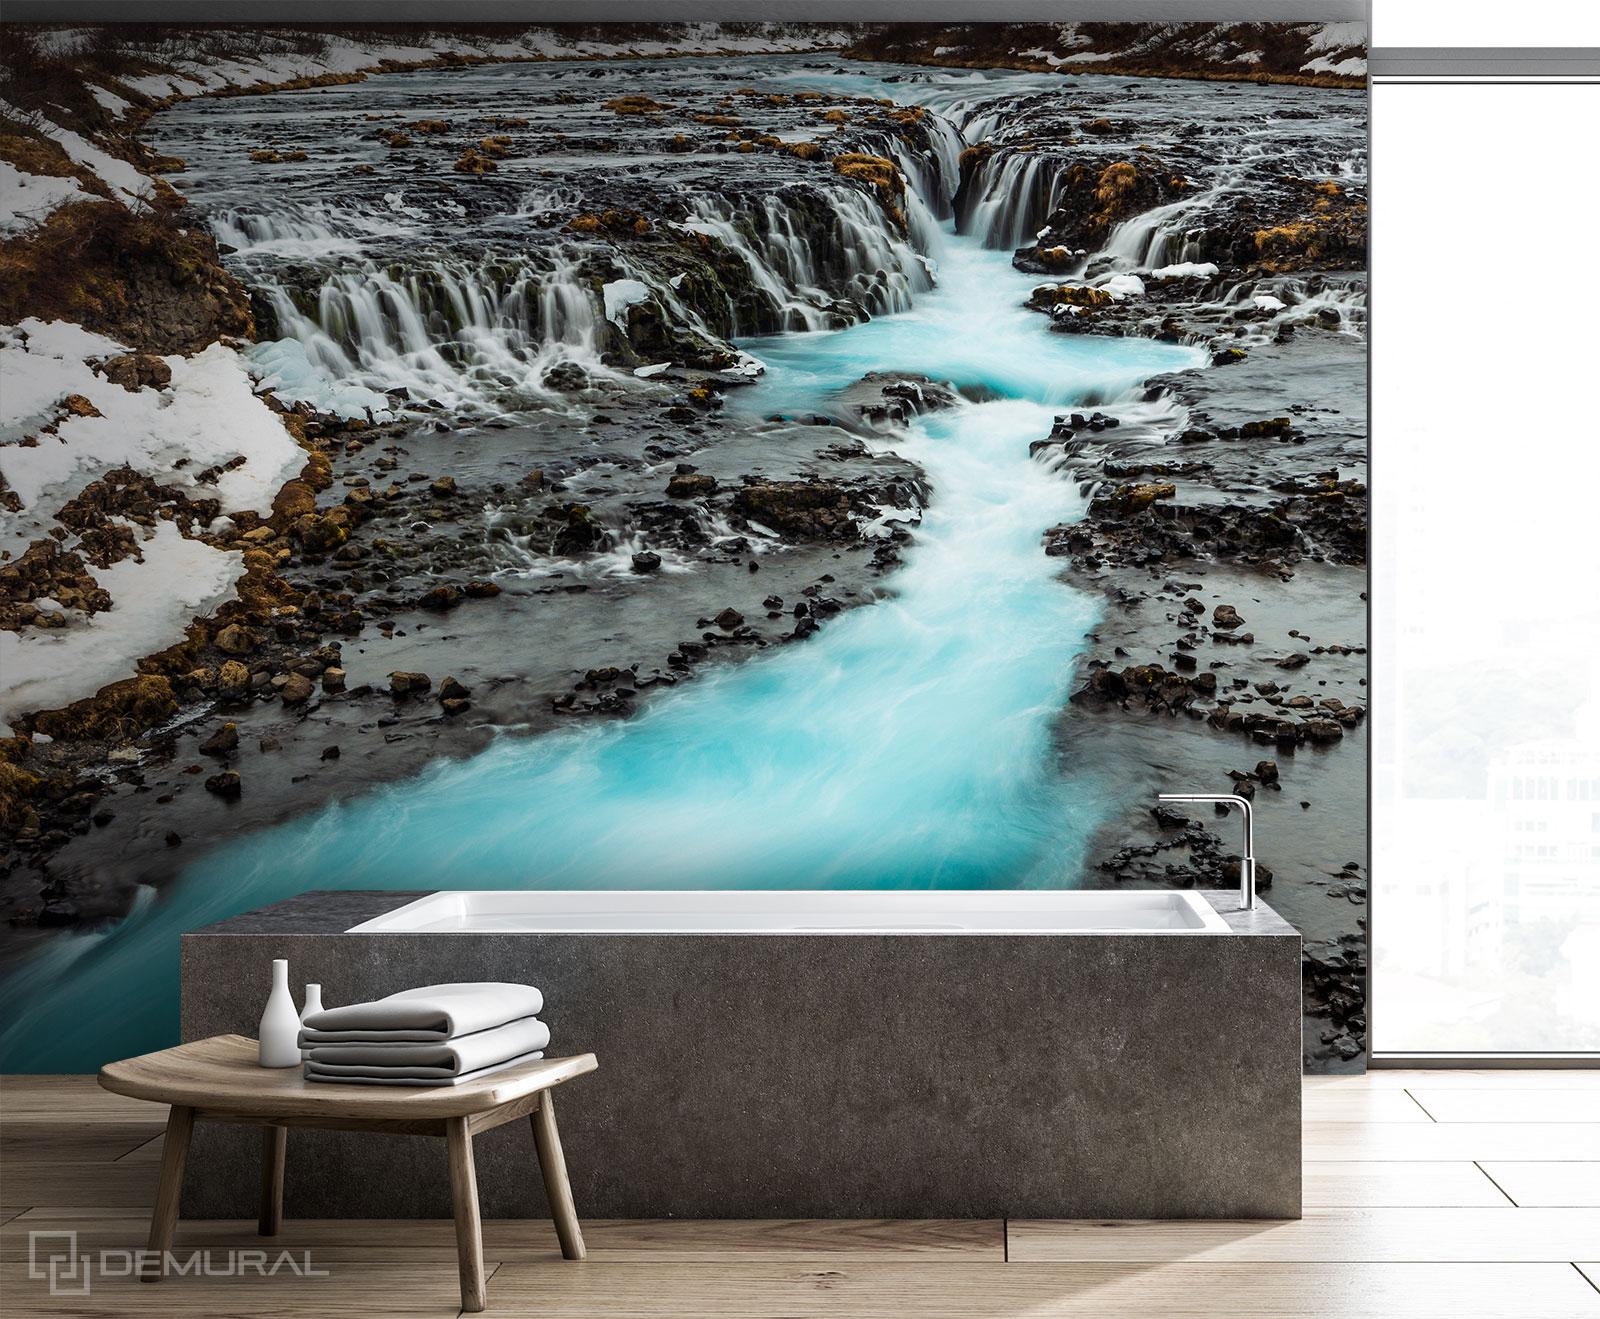 Fototapete Rohe Schönheit - Fototapete im Badezimmer - Demural